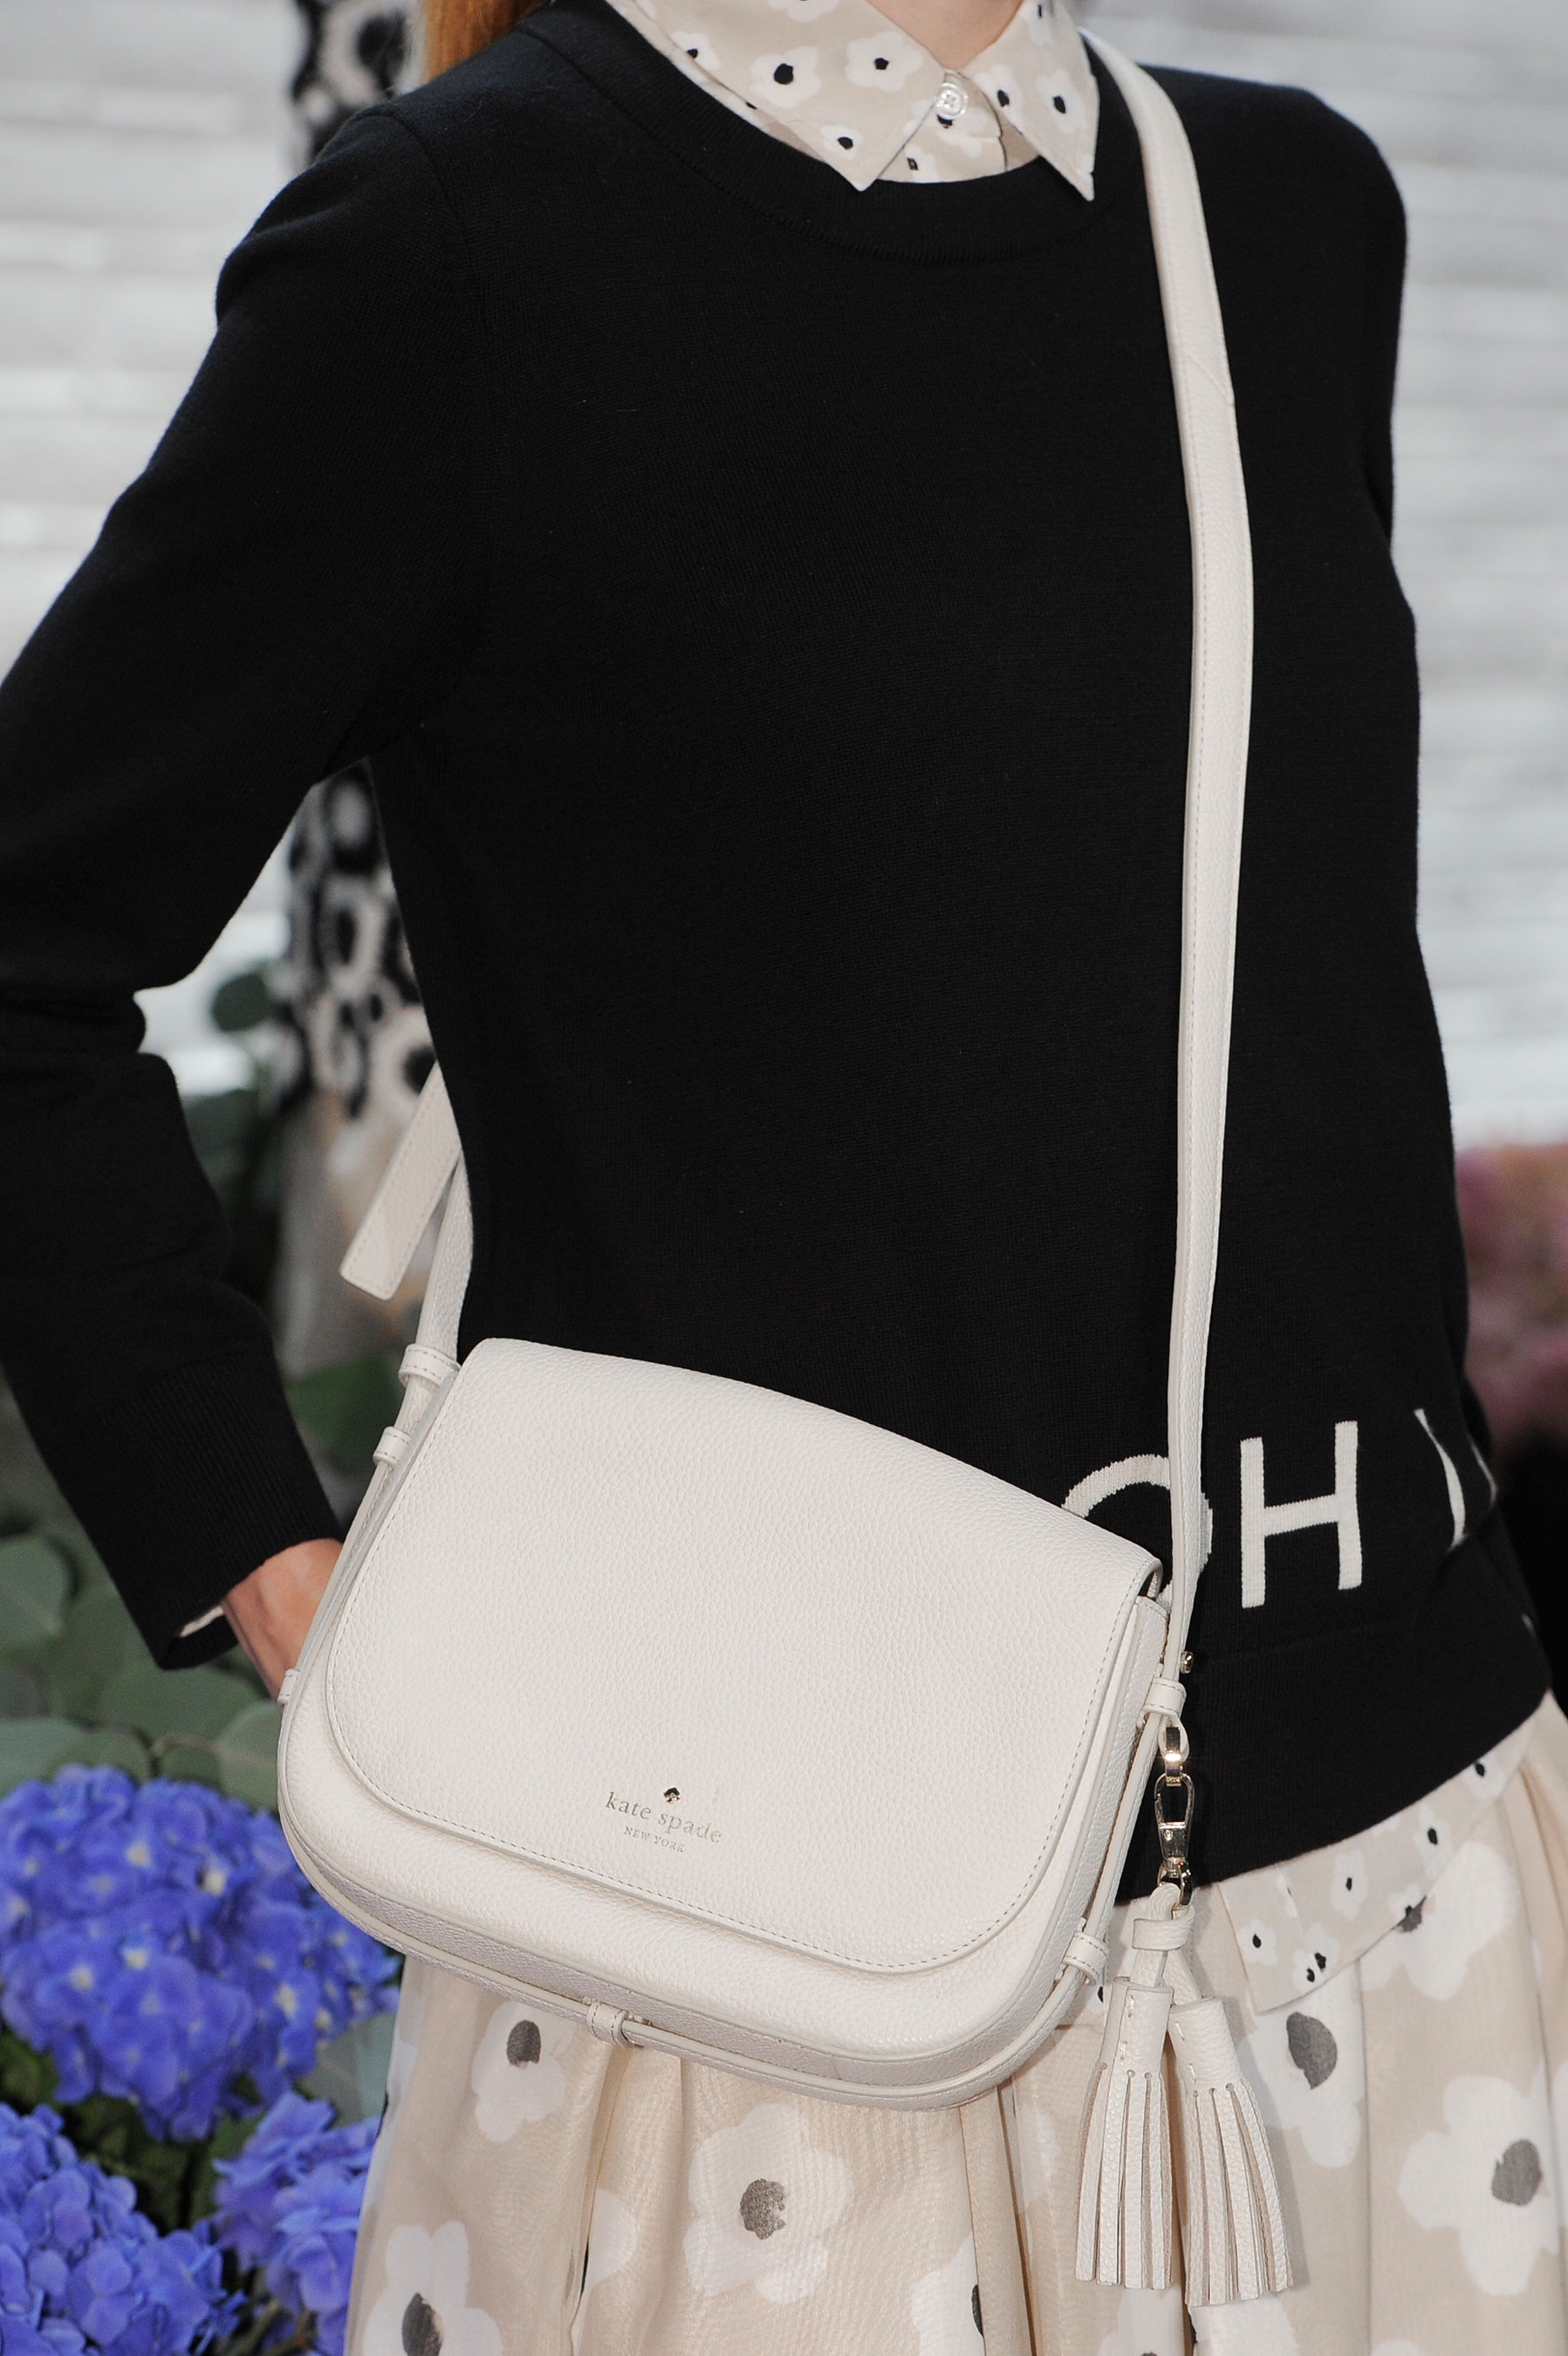 prada mini bag pink - Spring 2016 Bags - The Best Handbags From New York Fashion Week ...